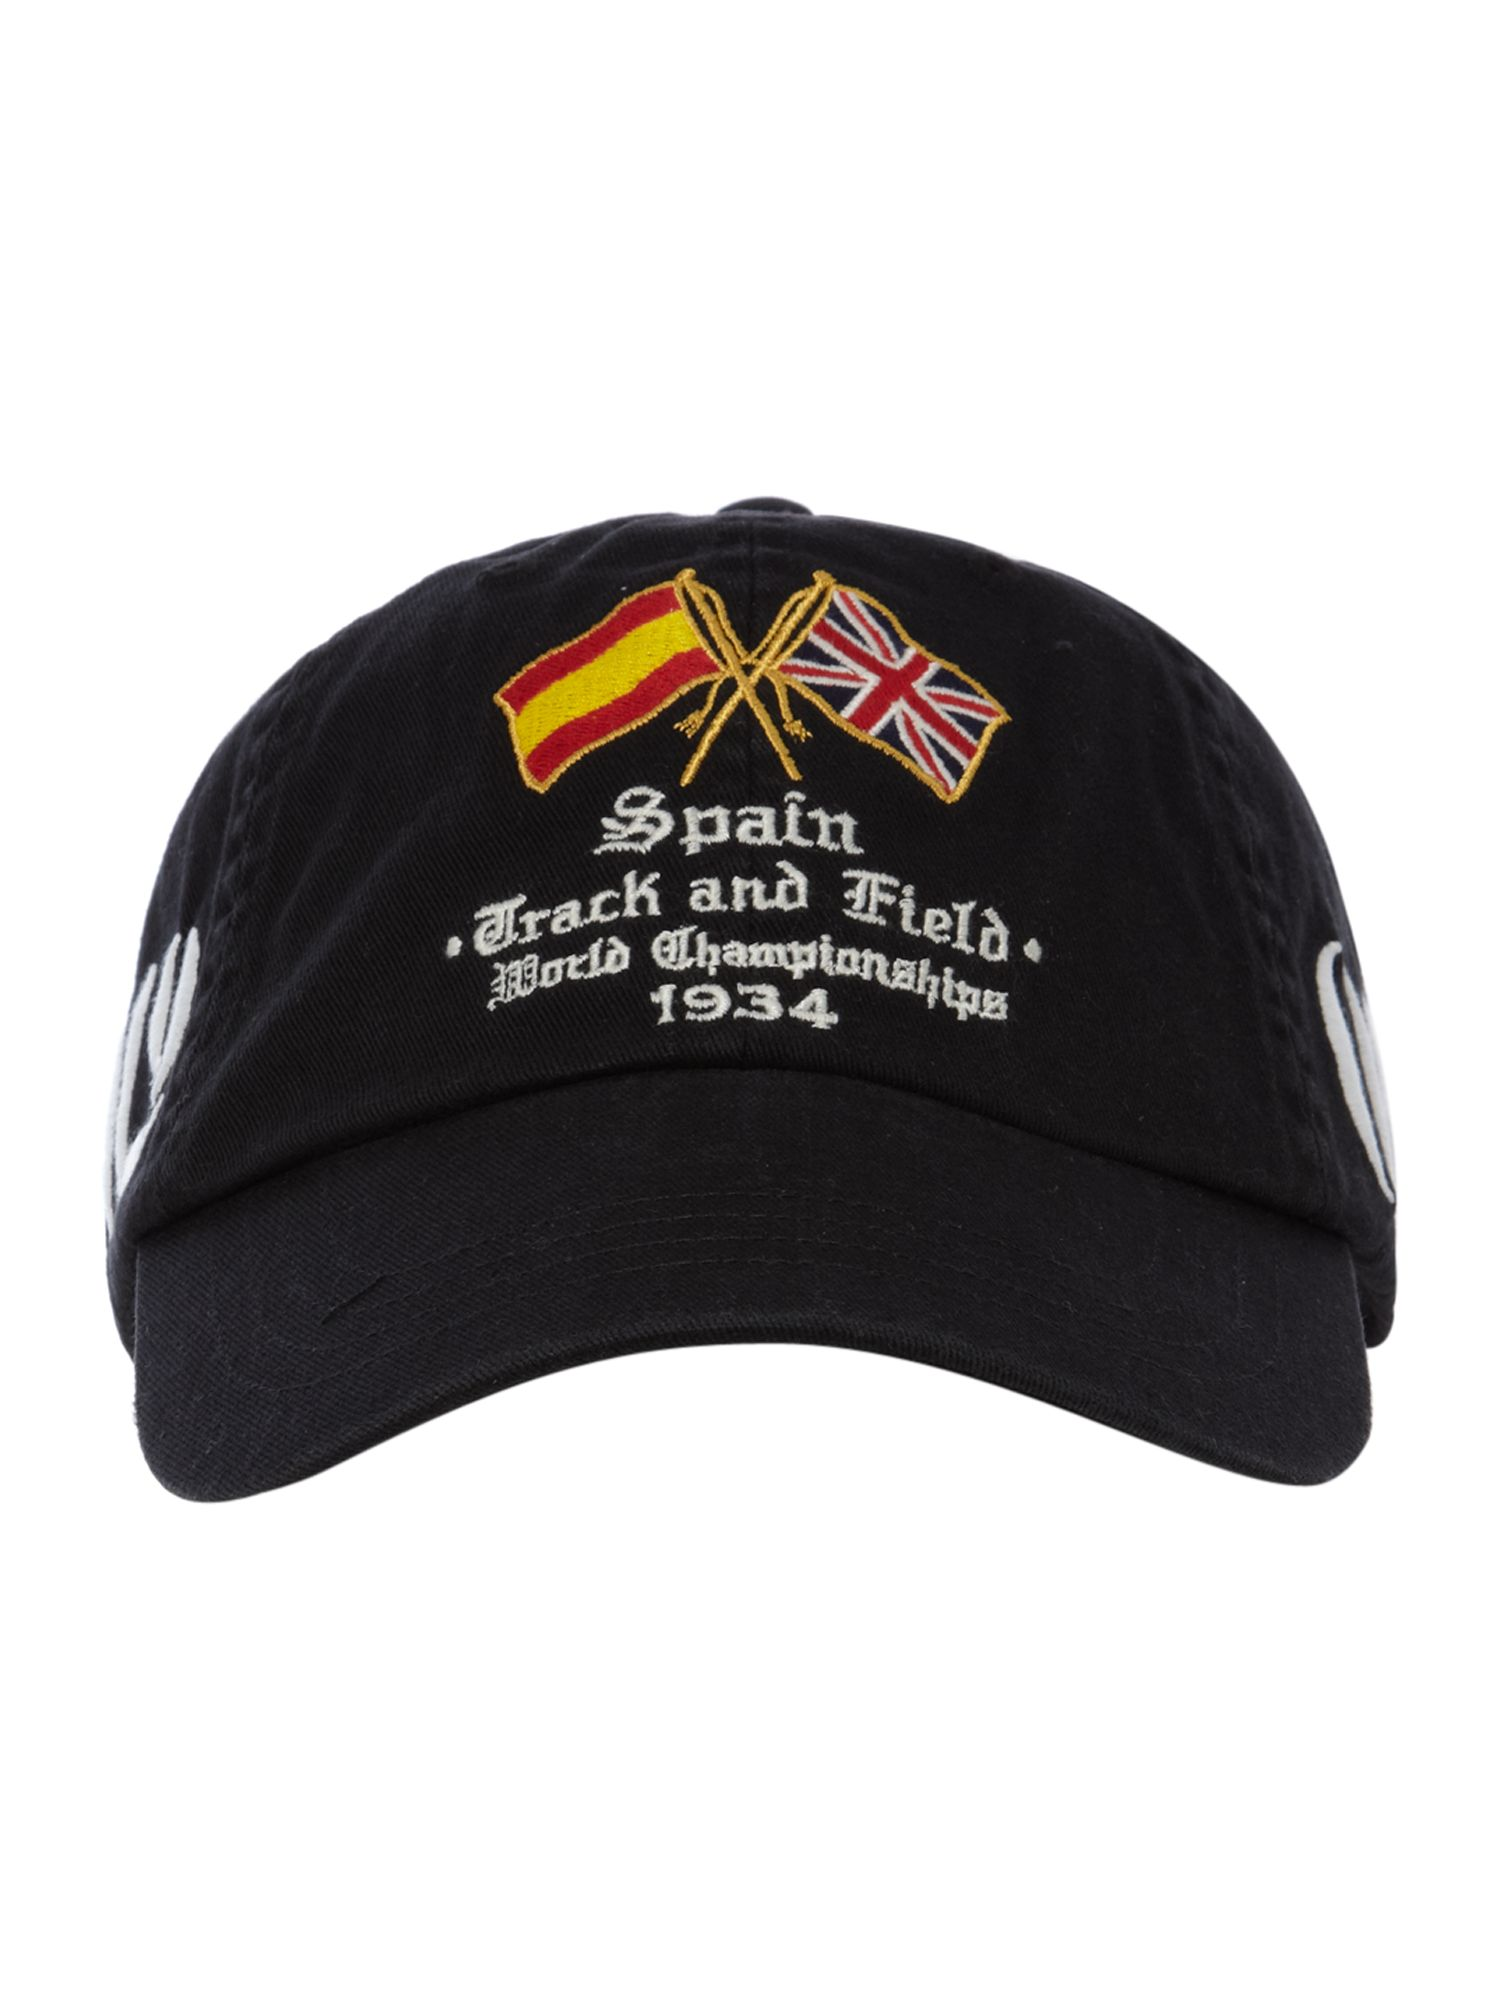 Polo Ralph Lauren Country Baseball Cap in Black for Men - Lyst 30af3055b294